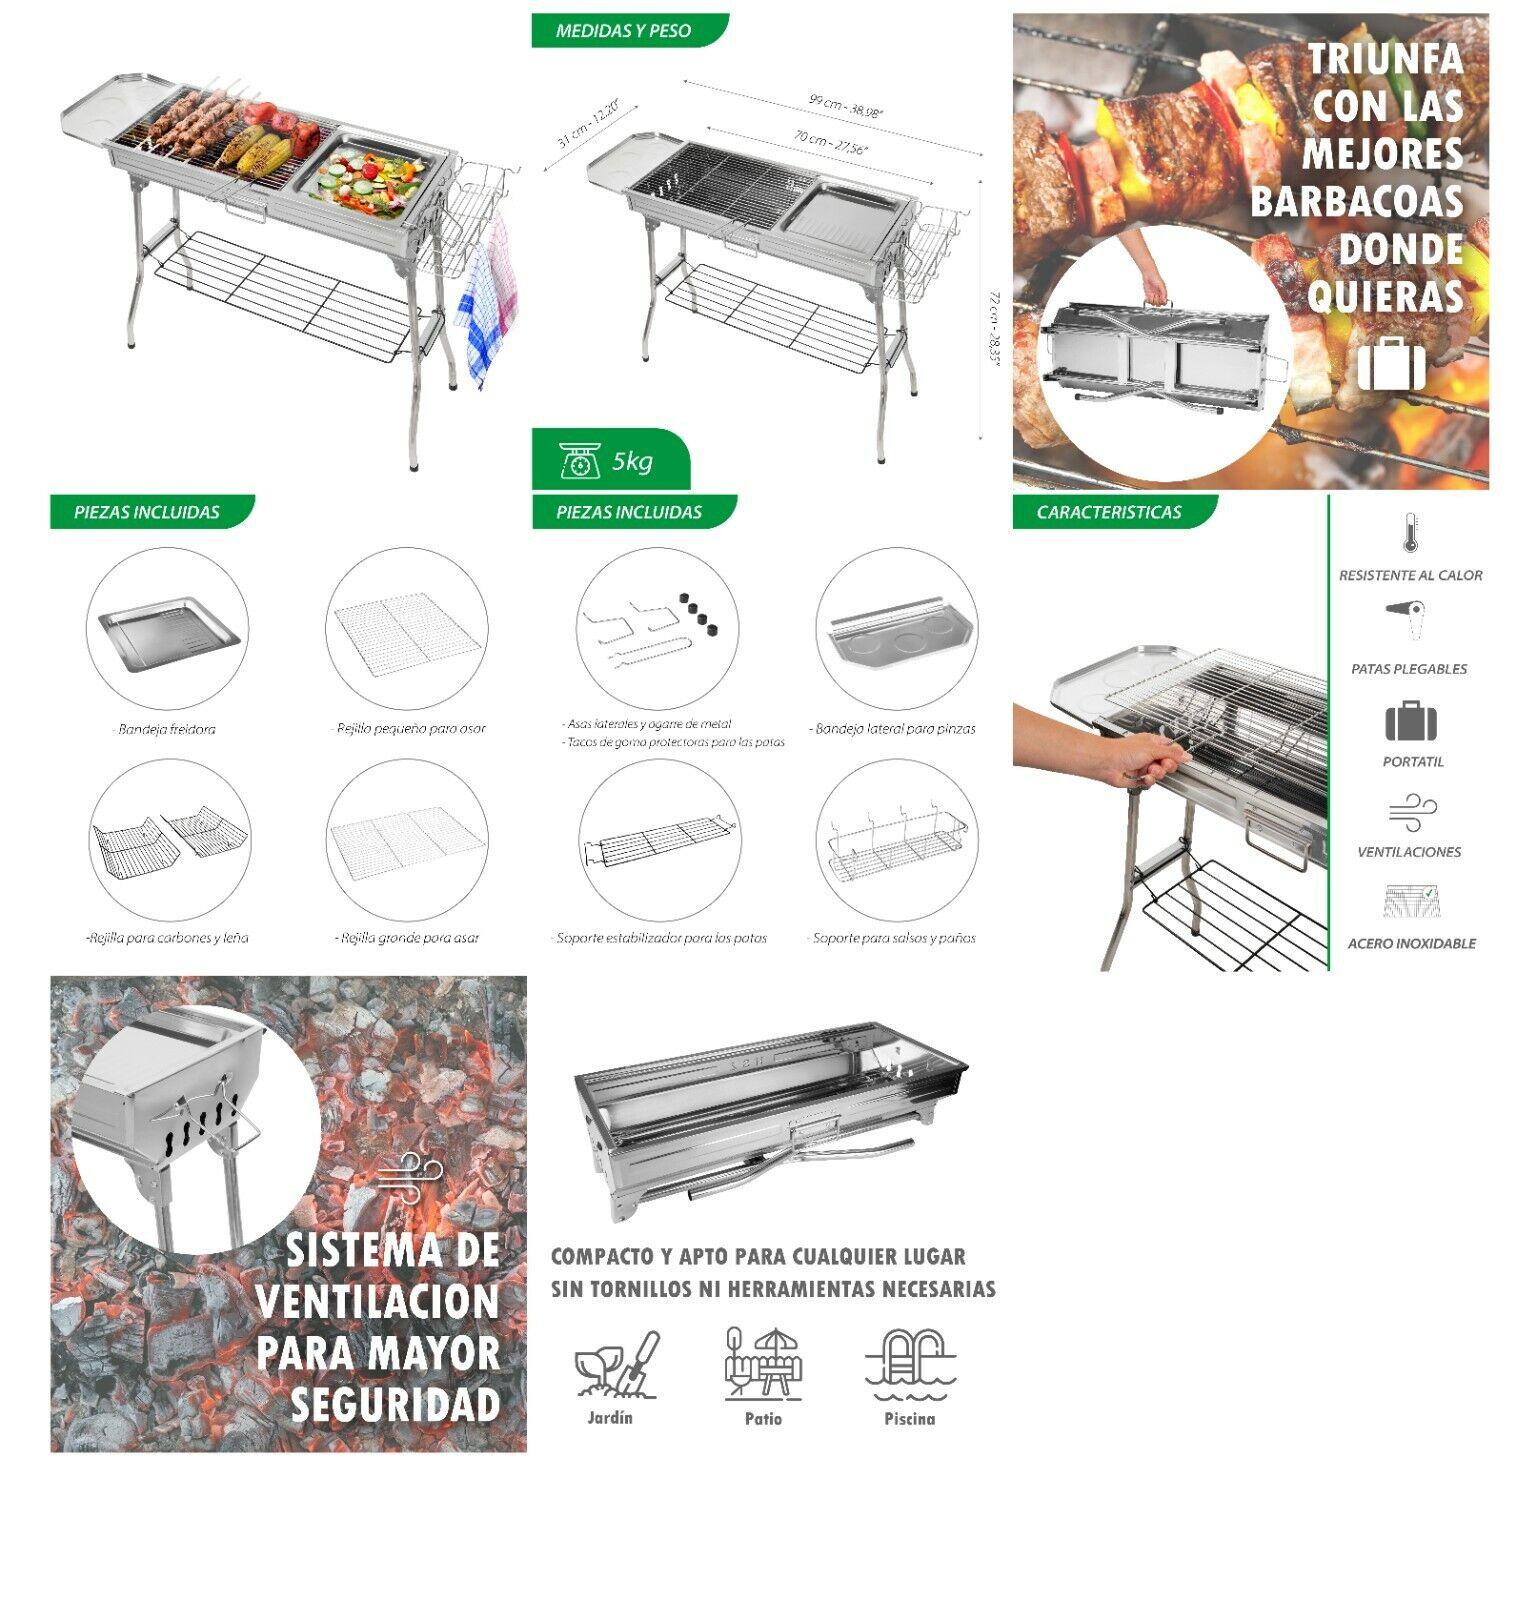 Barbacoa de Carbón BBQ Portátil Parilla de Carbón Plegable Acampada Picnic al